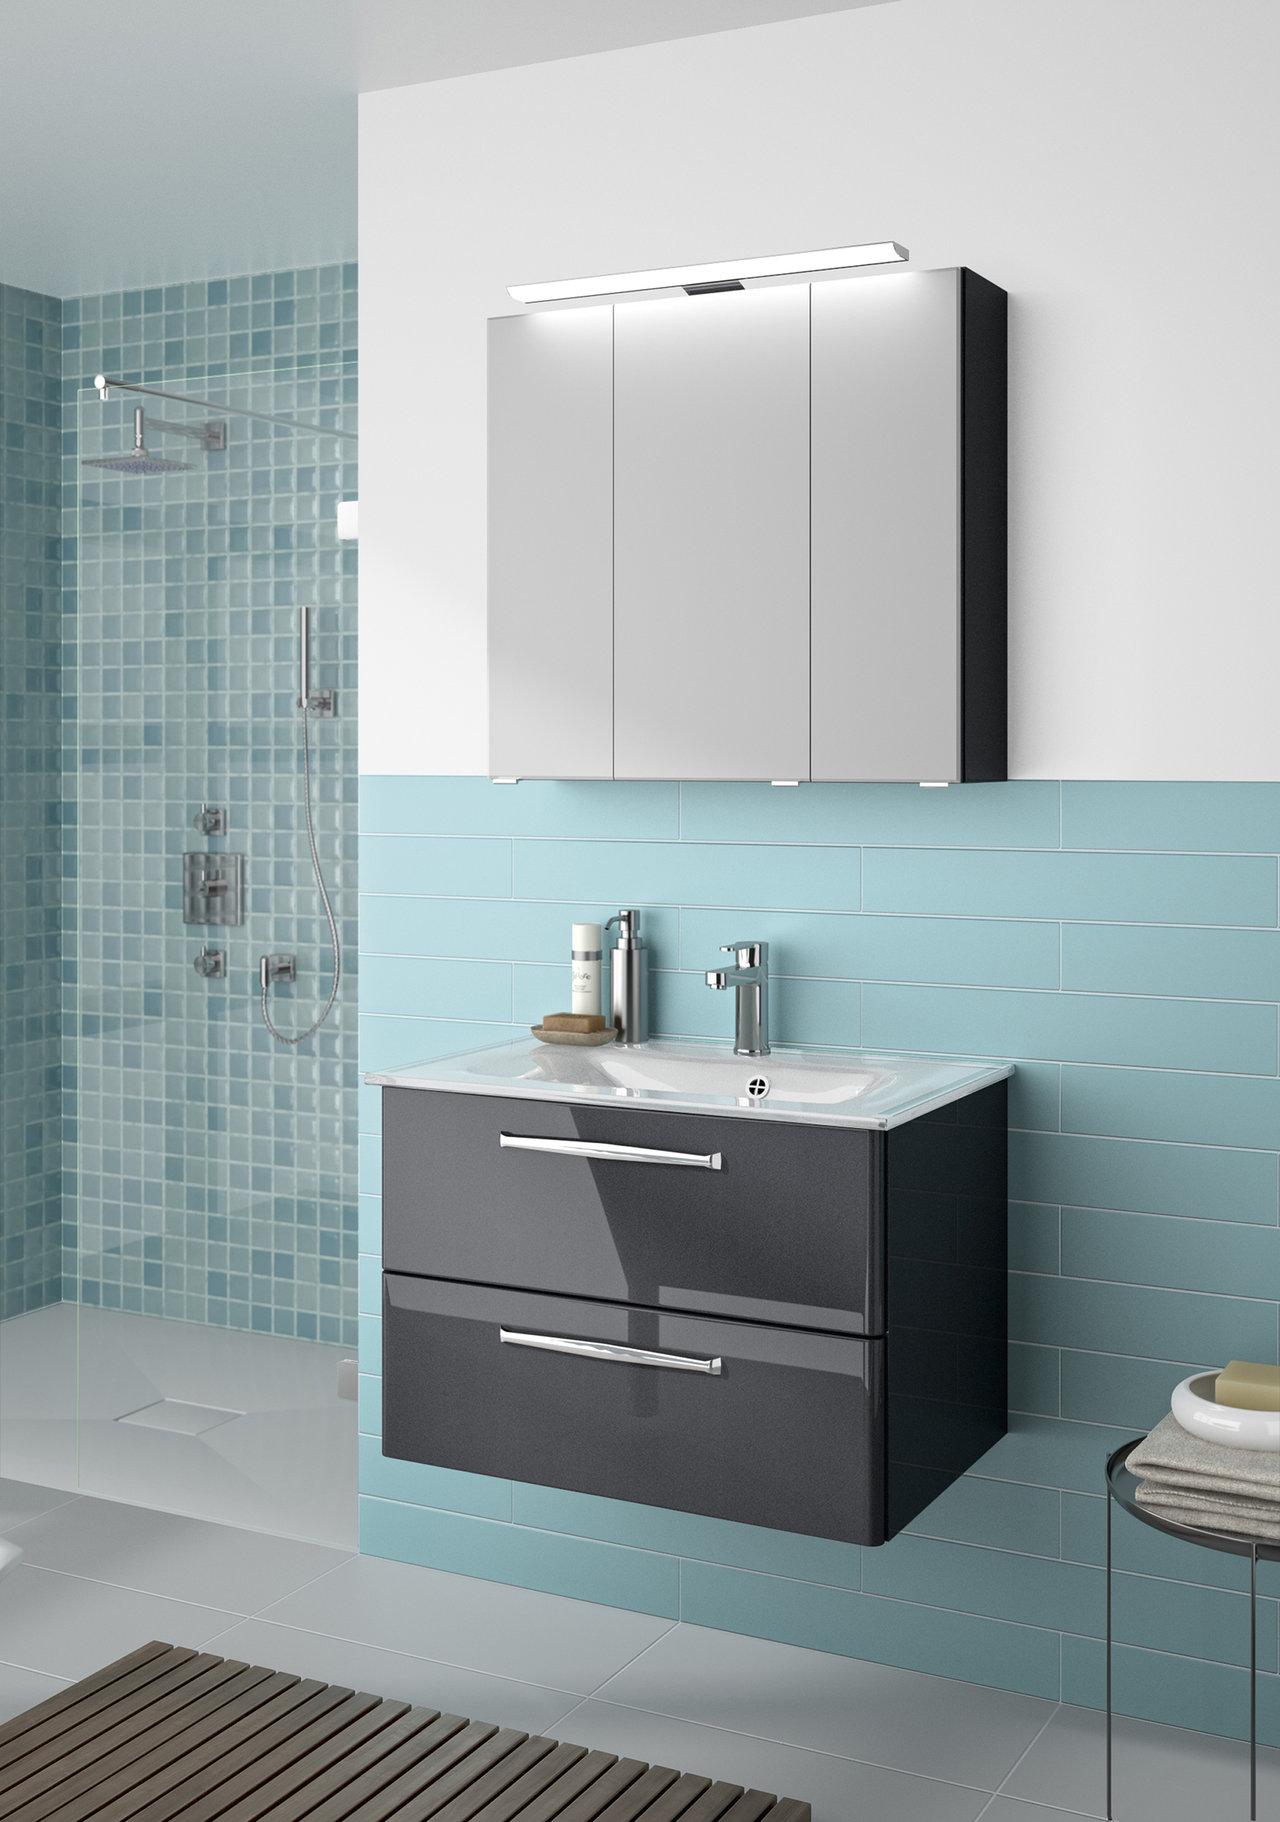 TRENTINO - Fokus - Bathroom furniture - Brands furniture